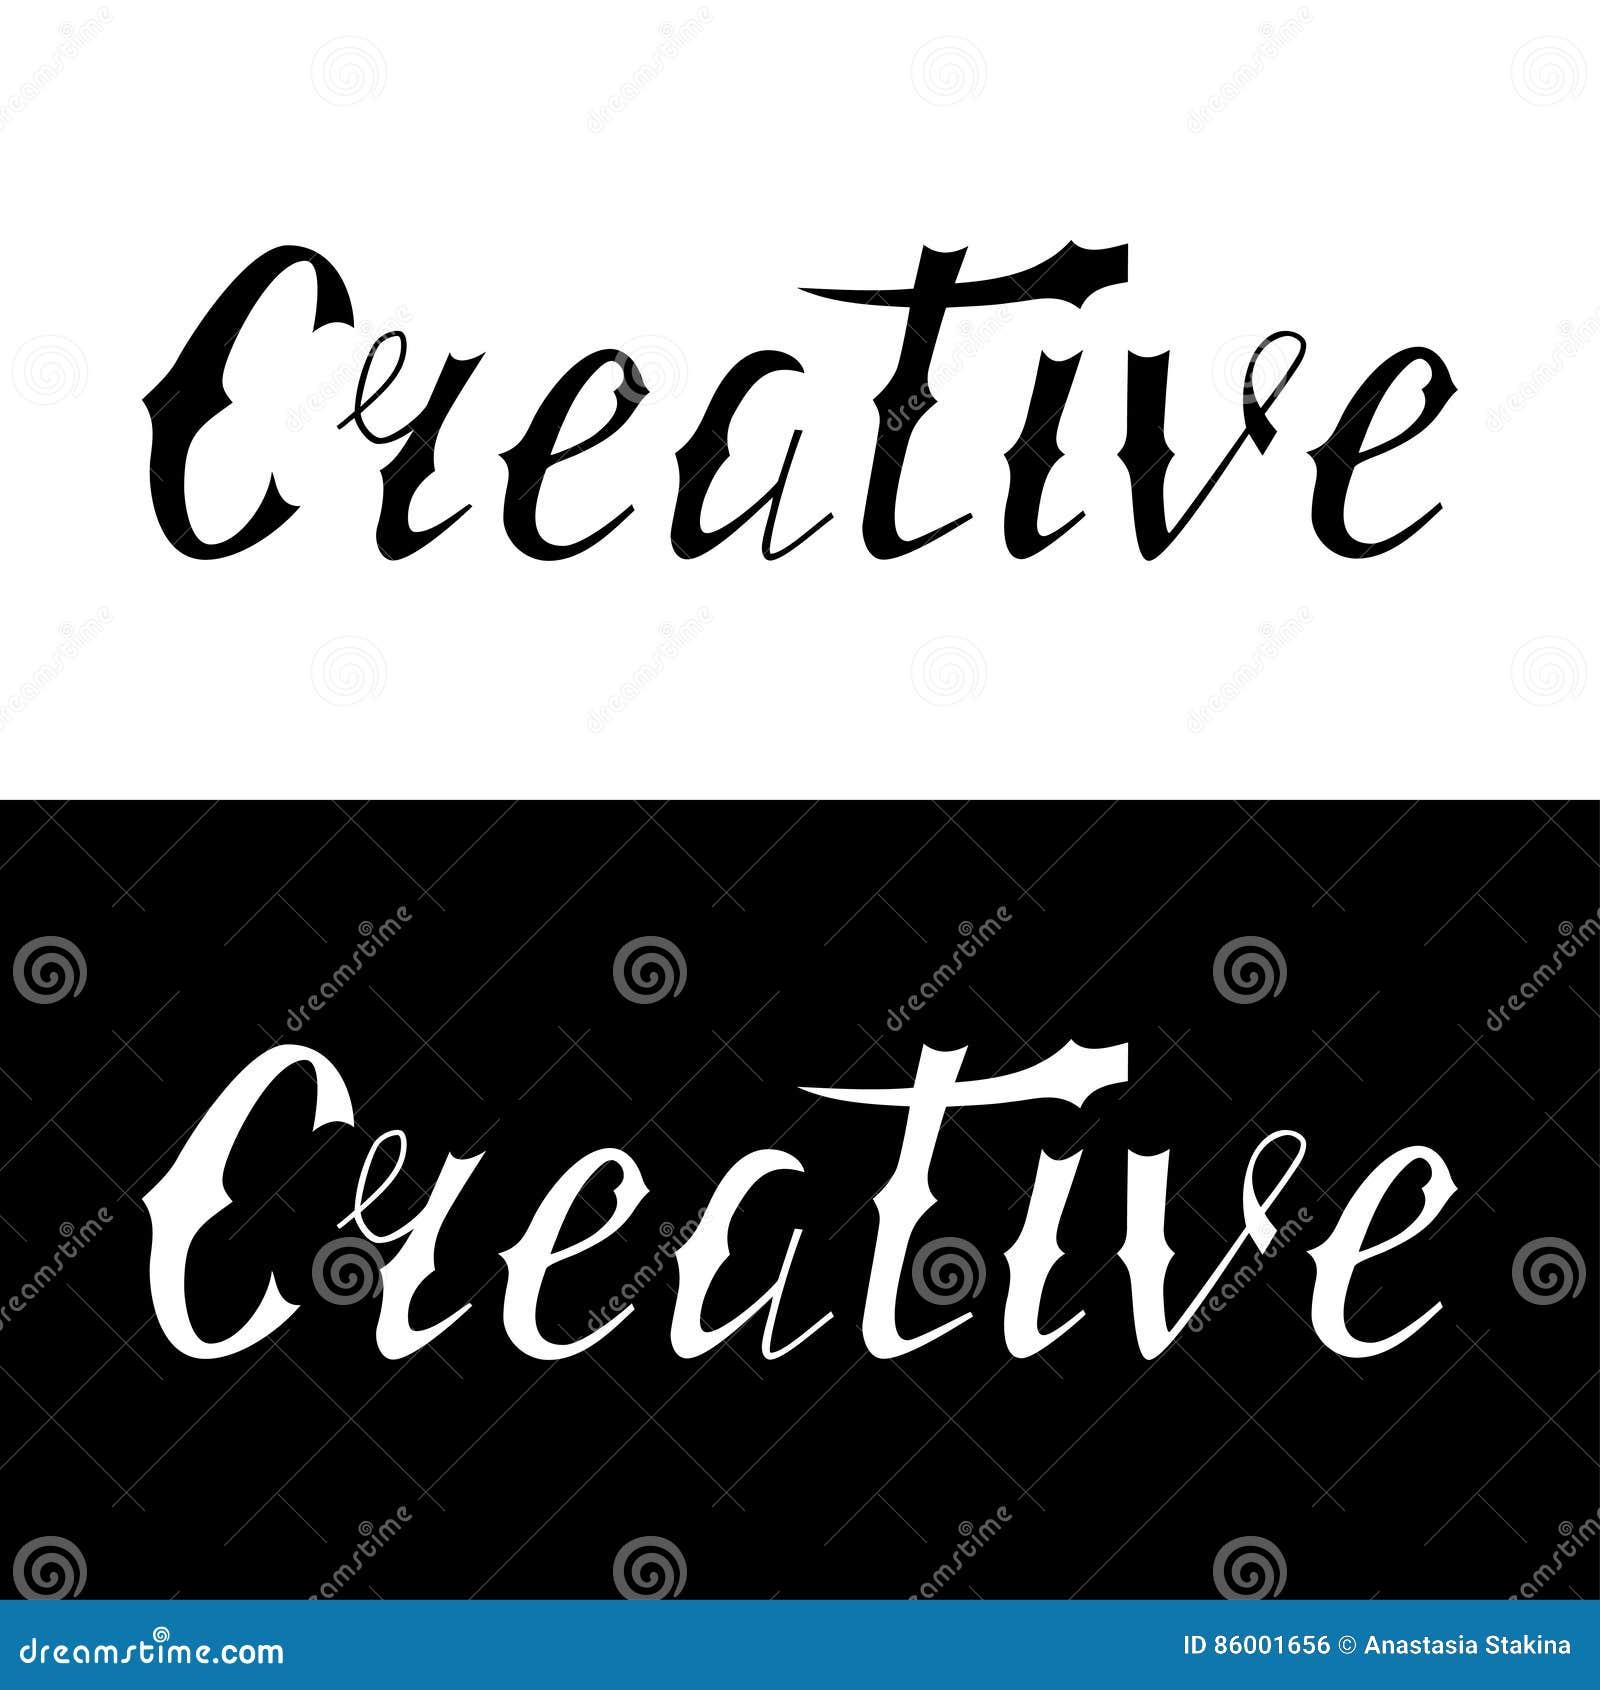 Creative - ready